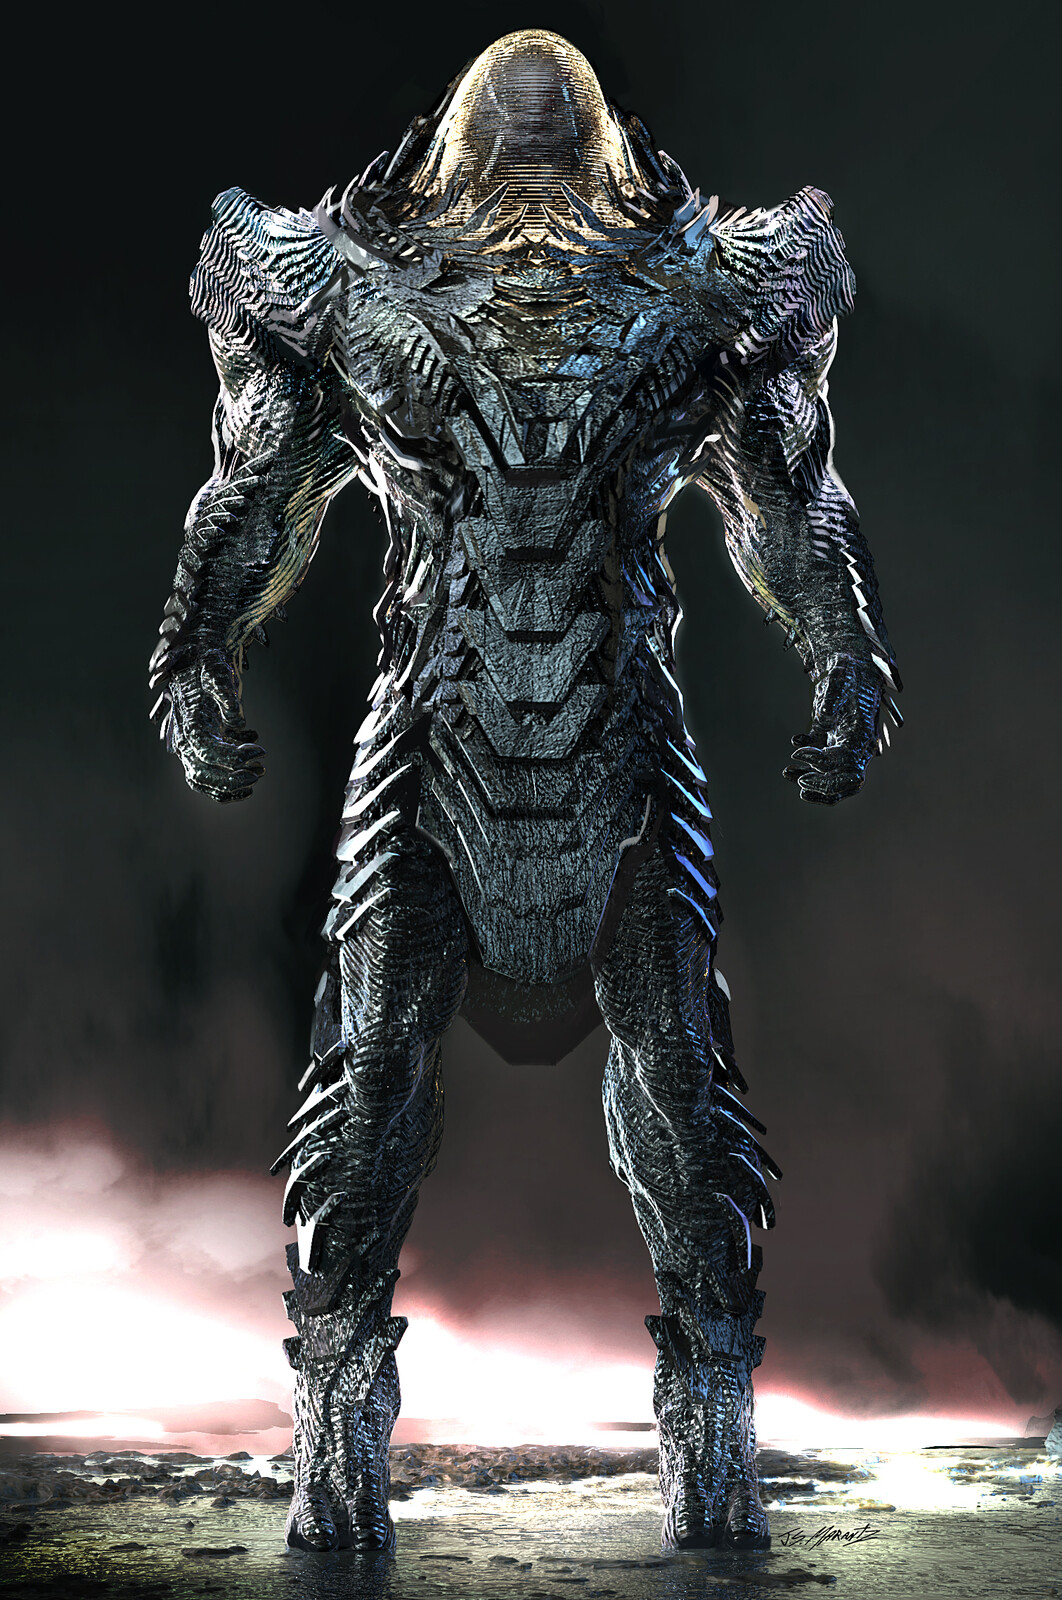 APOKOLIPSE Guard for Zack Snyder's Justice League